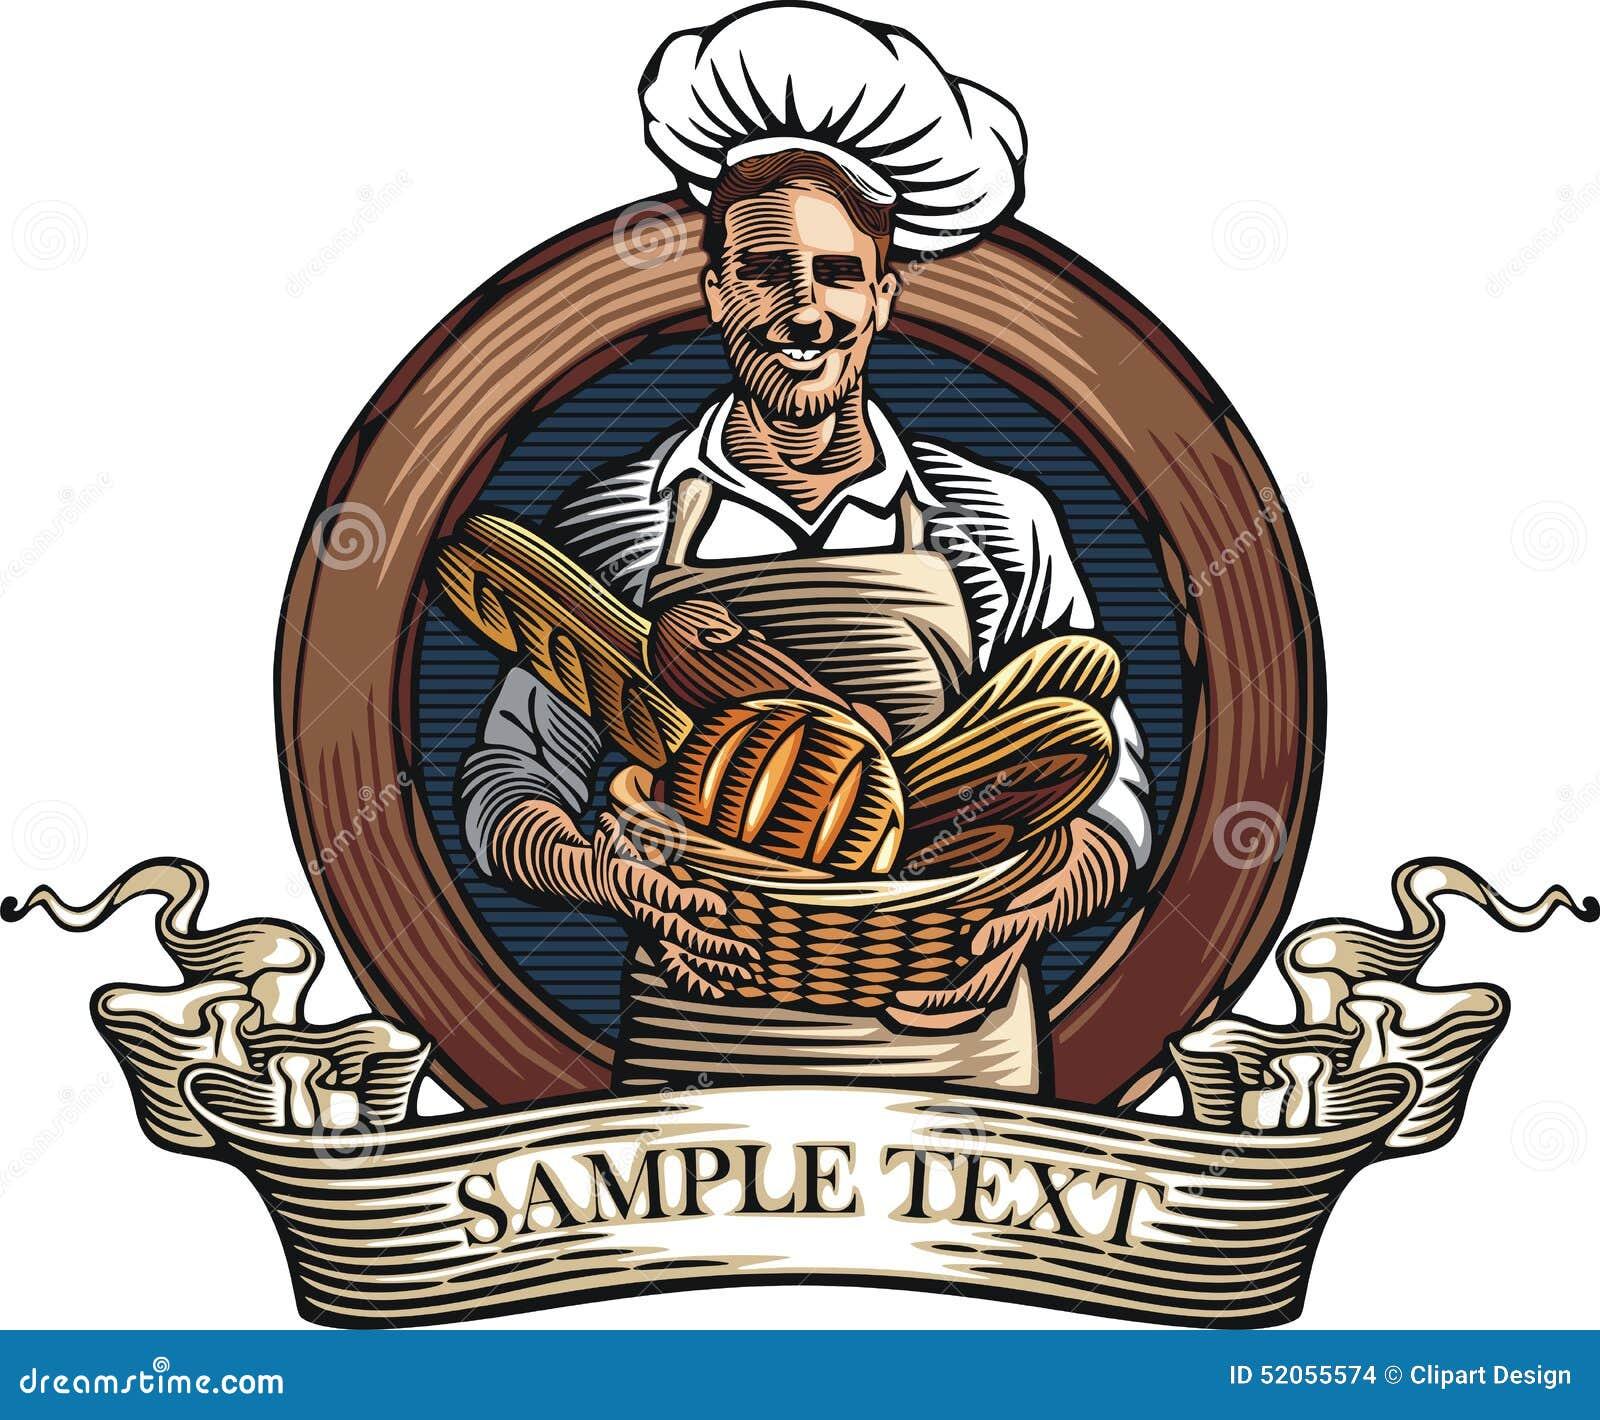 Baker Vector Illustration in Woodcut Style